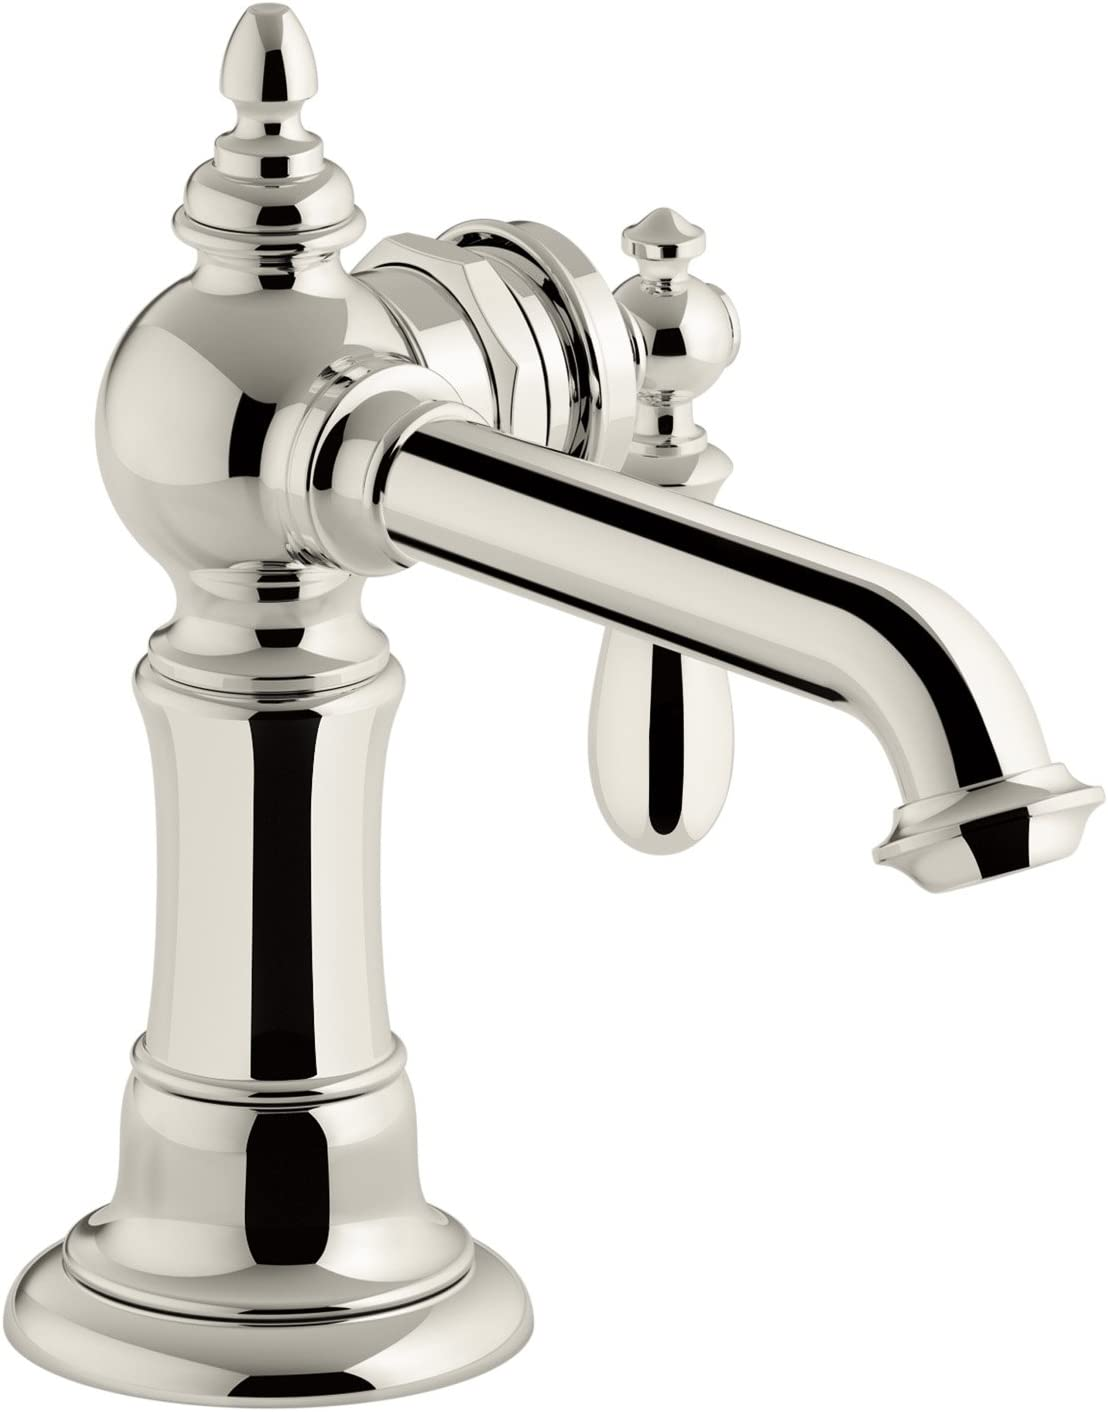 Kohler K 72762 9m Sn Artifacts Single Handle Bathroom Sink Faucet Vibrant Polished Nickel Amazon Com